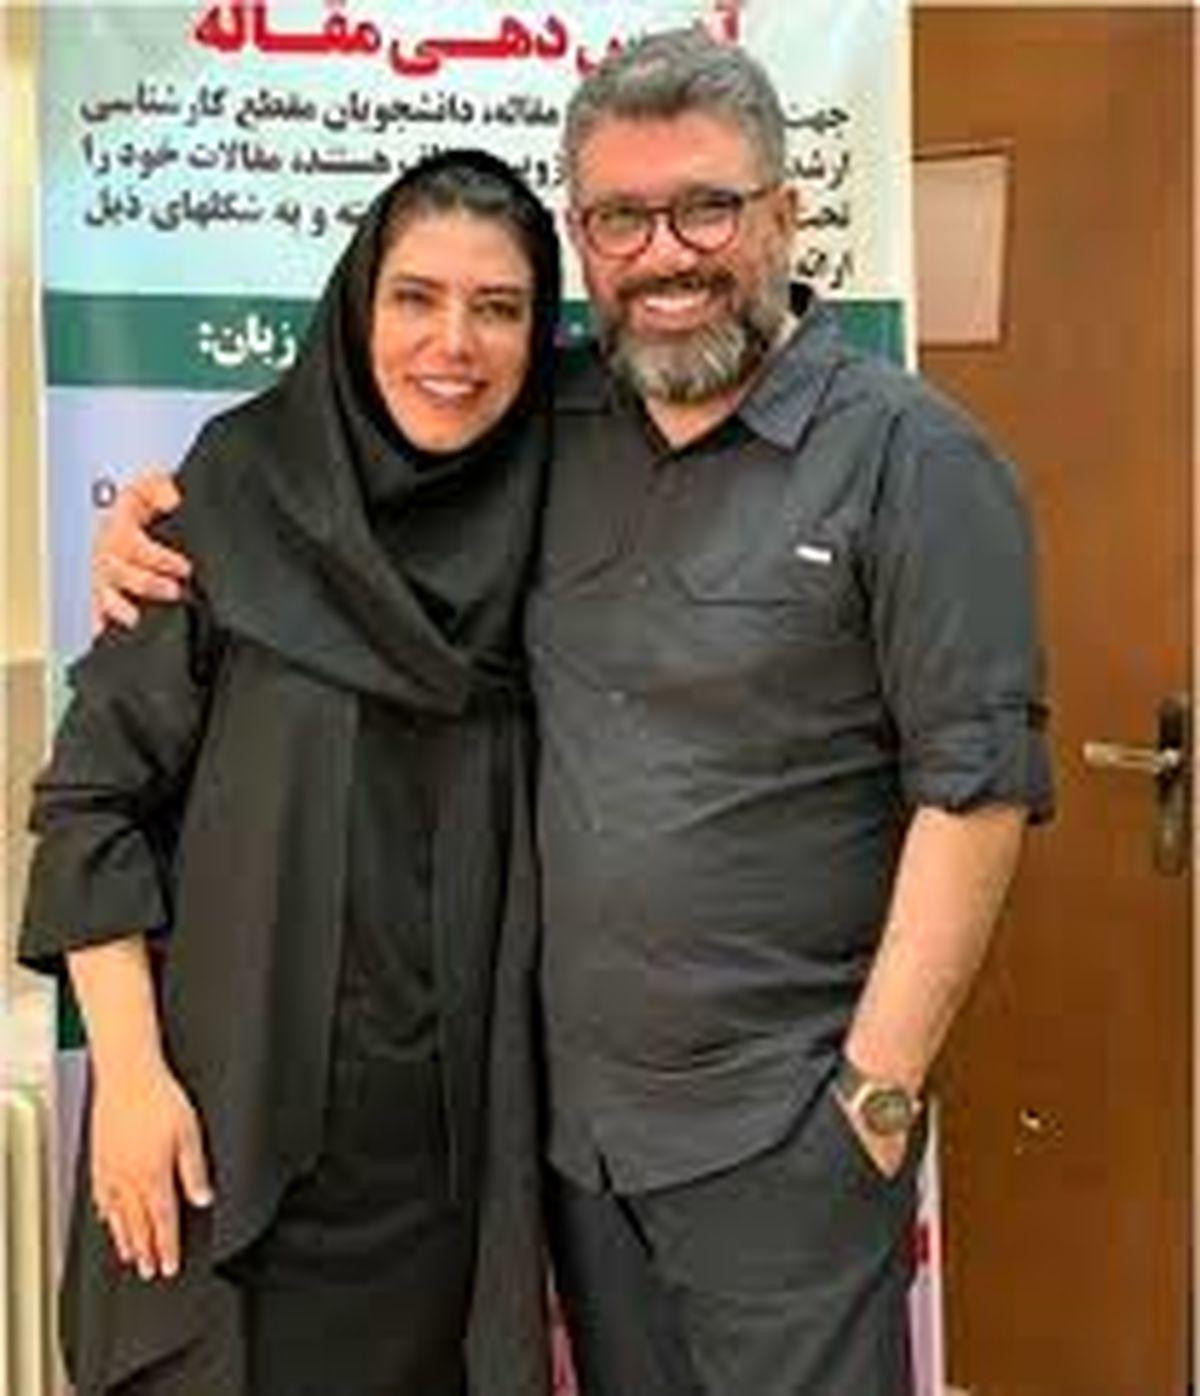 توئیت انتقادی سیاسی رضا رشیدپور جنجالی شد + عکس